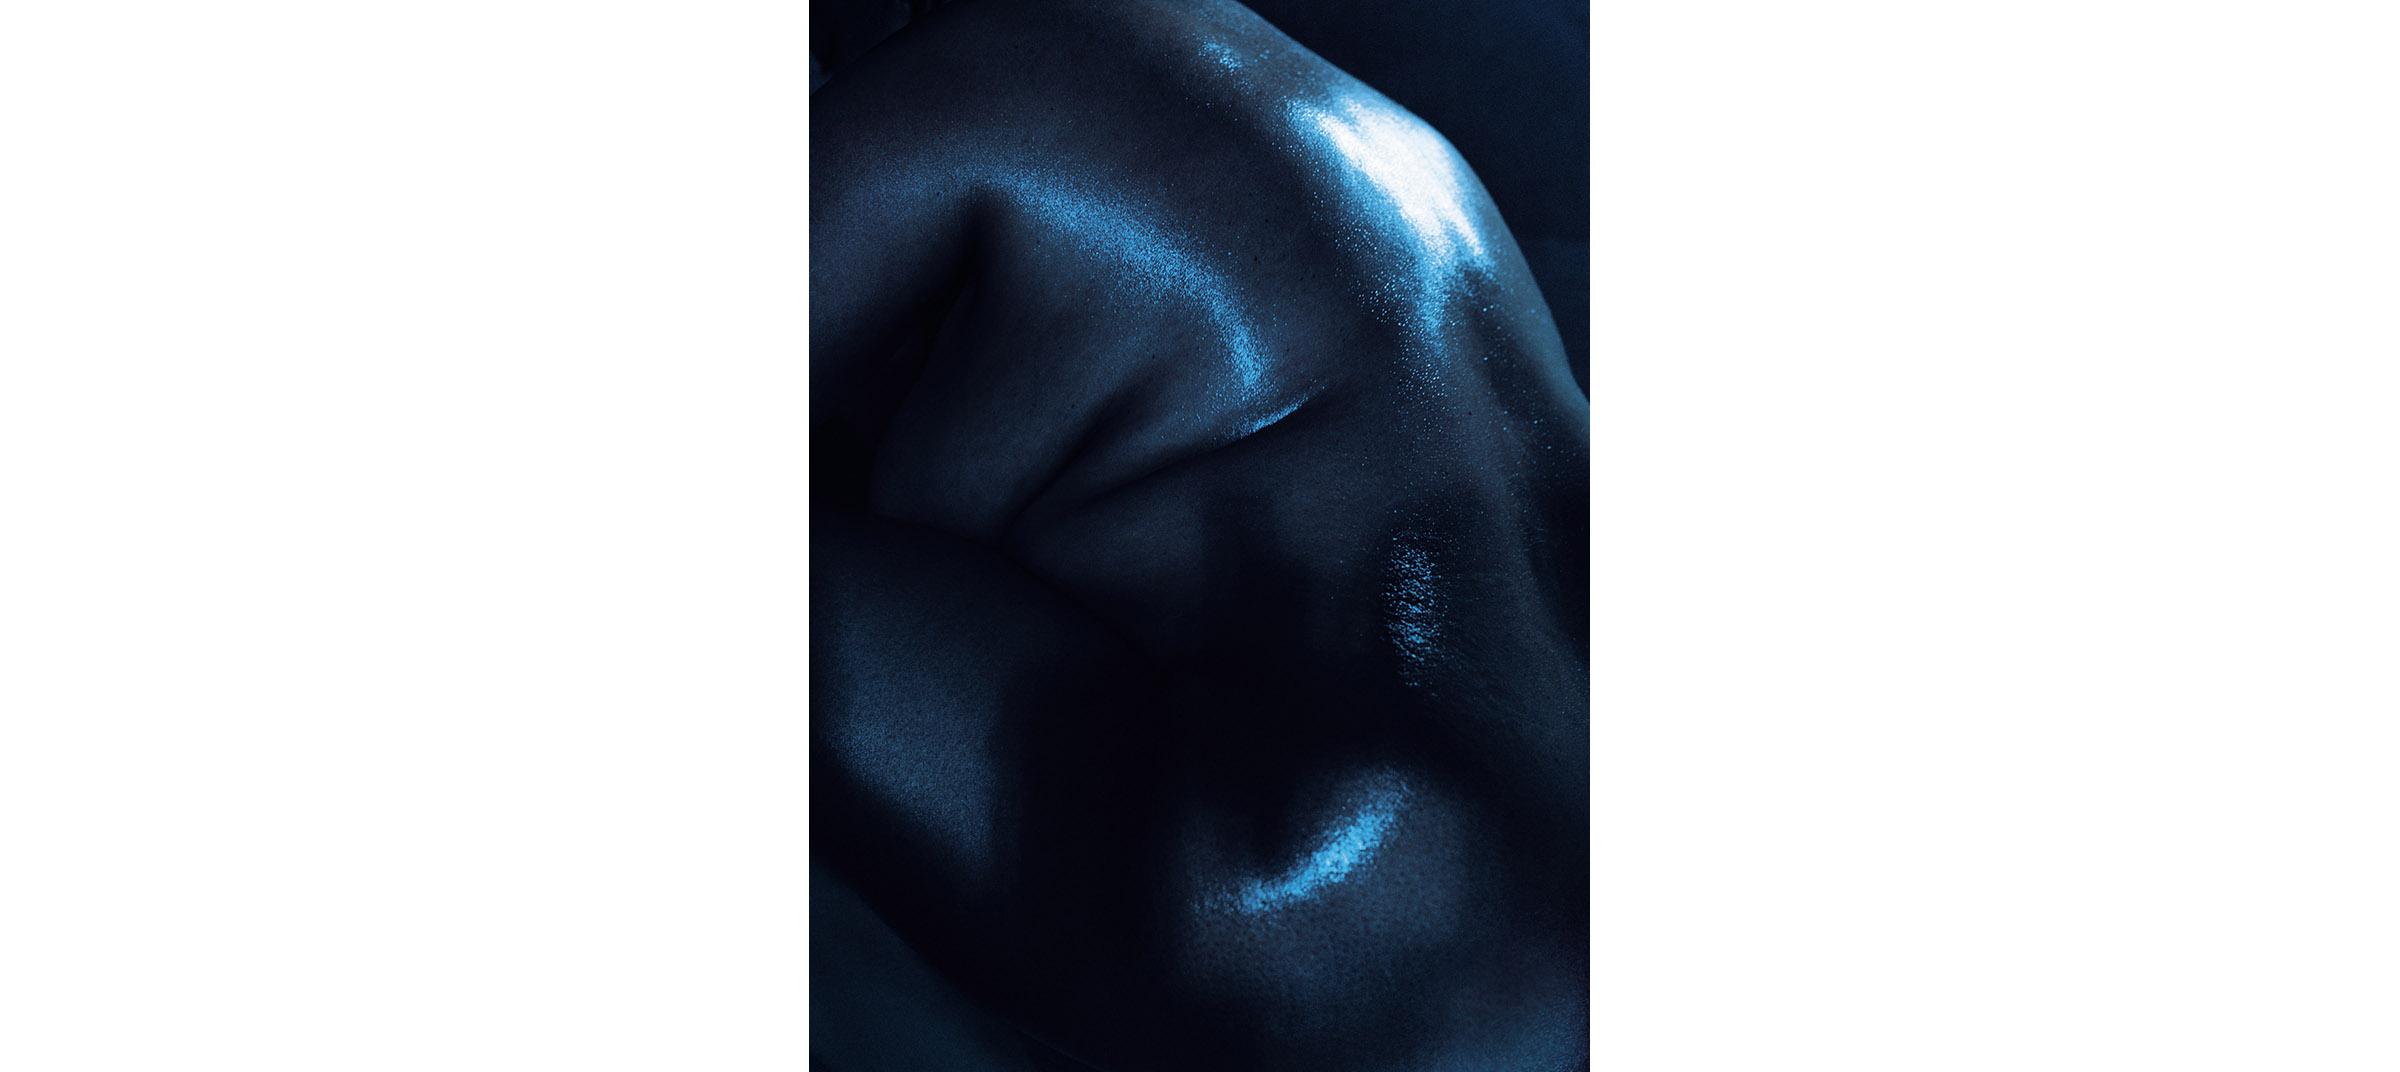 Blue Nudes  Untitled N°7, 2005 Tirage gélatino argentique, 144 x 104 cm | Gelatin silver print 56,59 x 40,94 inches  4/5